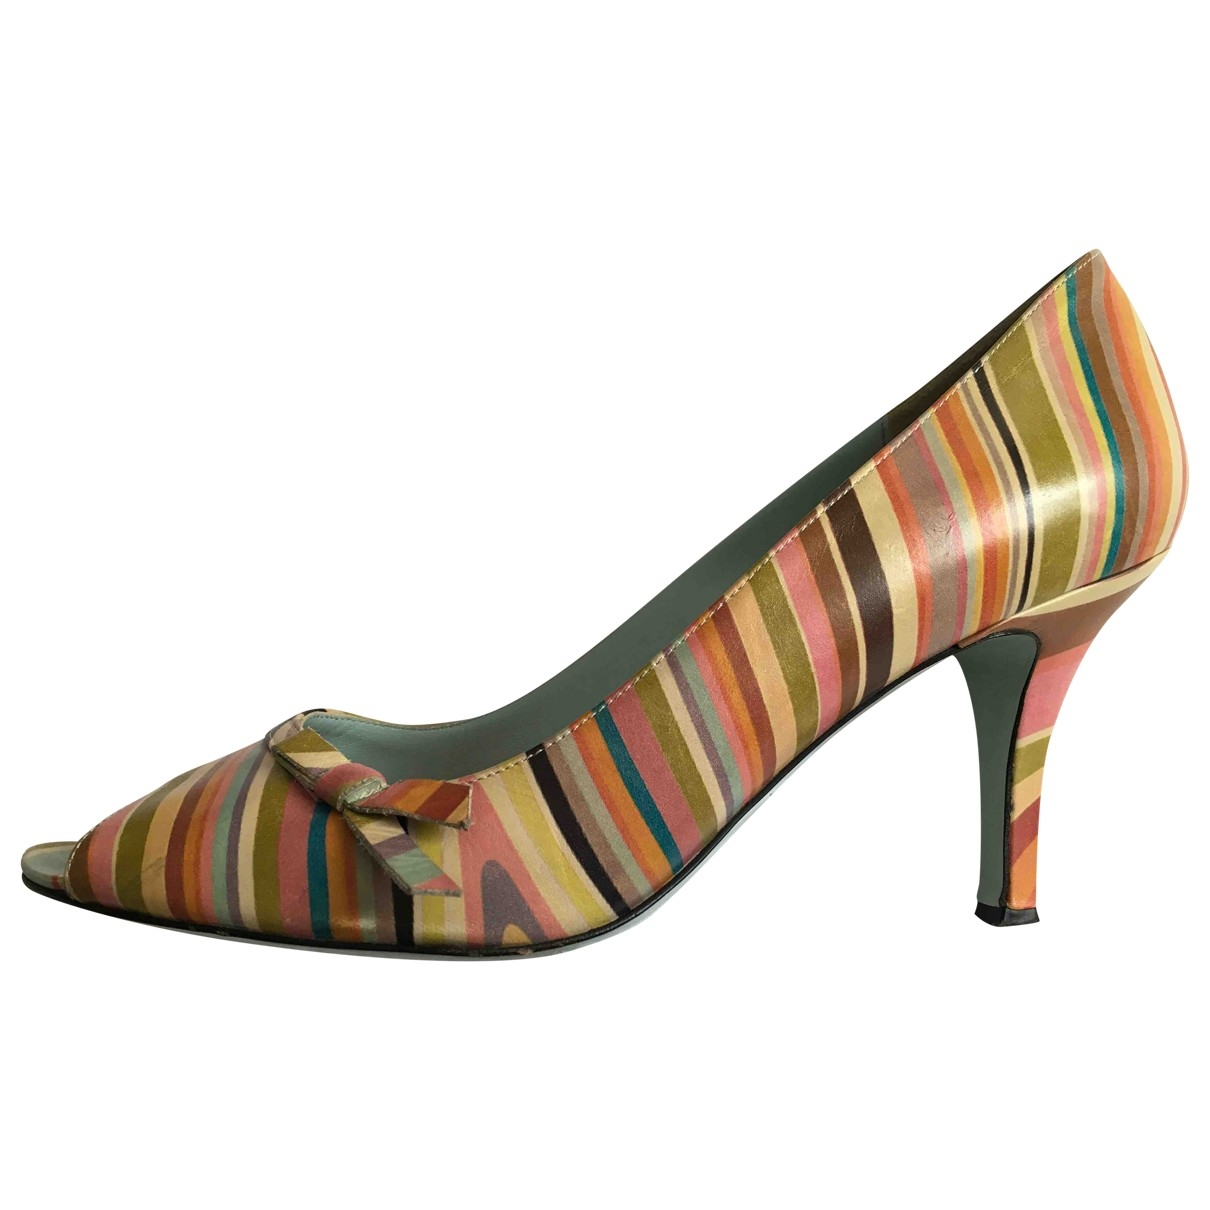 Paul Smith \N Multicolour Leather Sandals for Women 39.5 EU